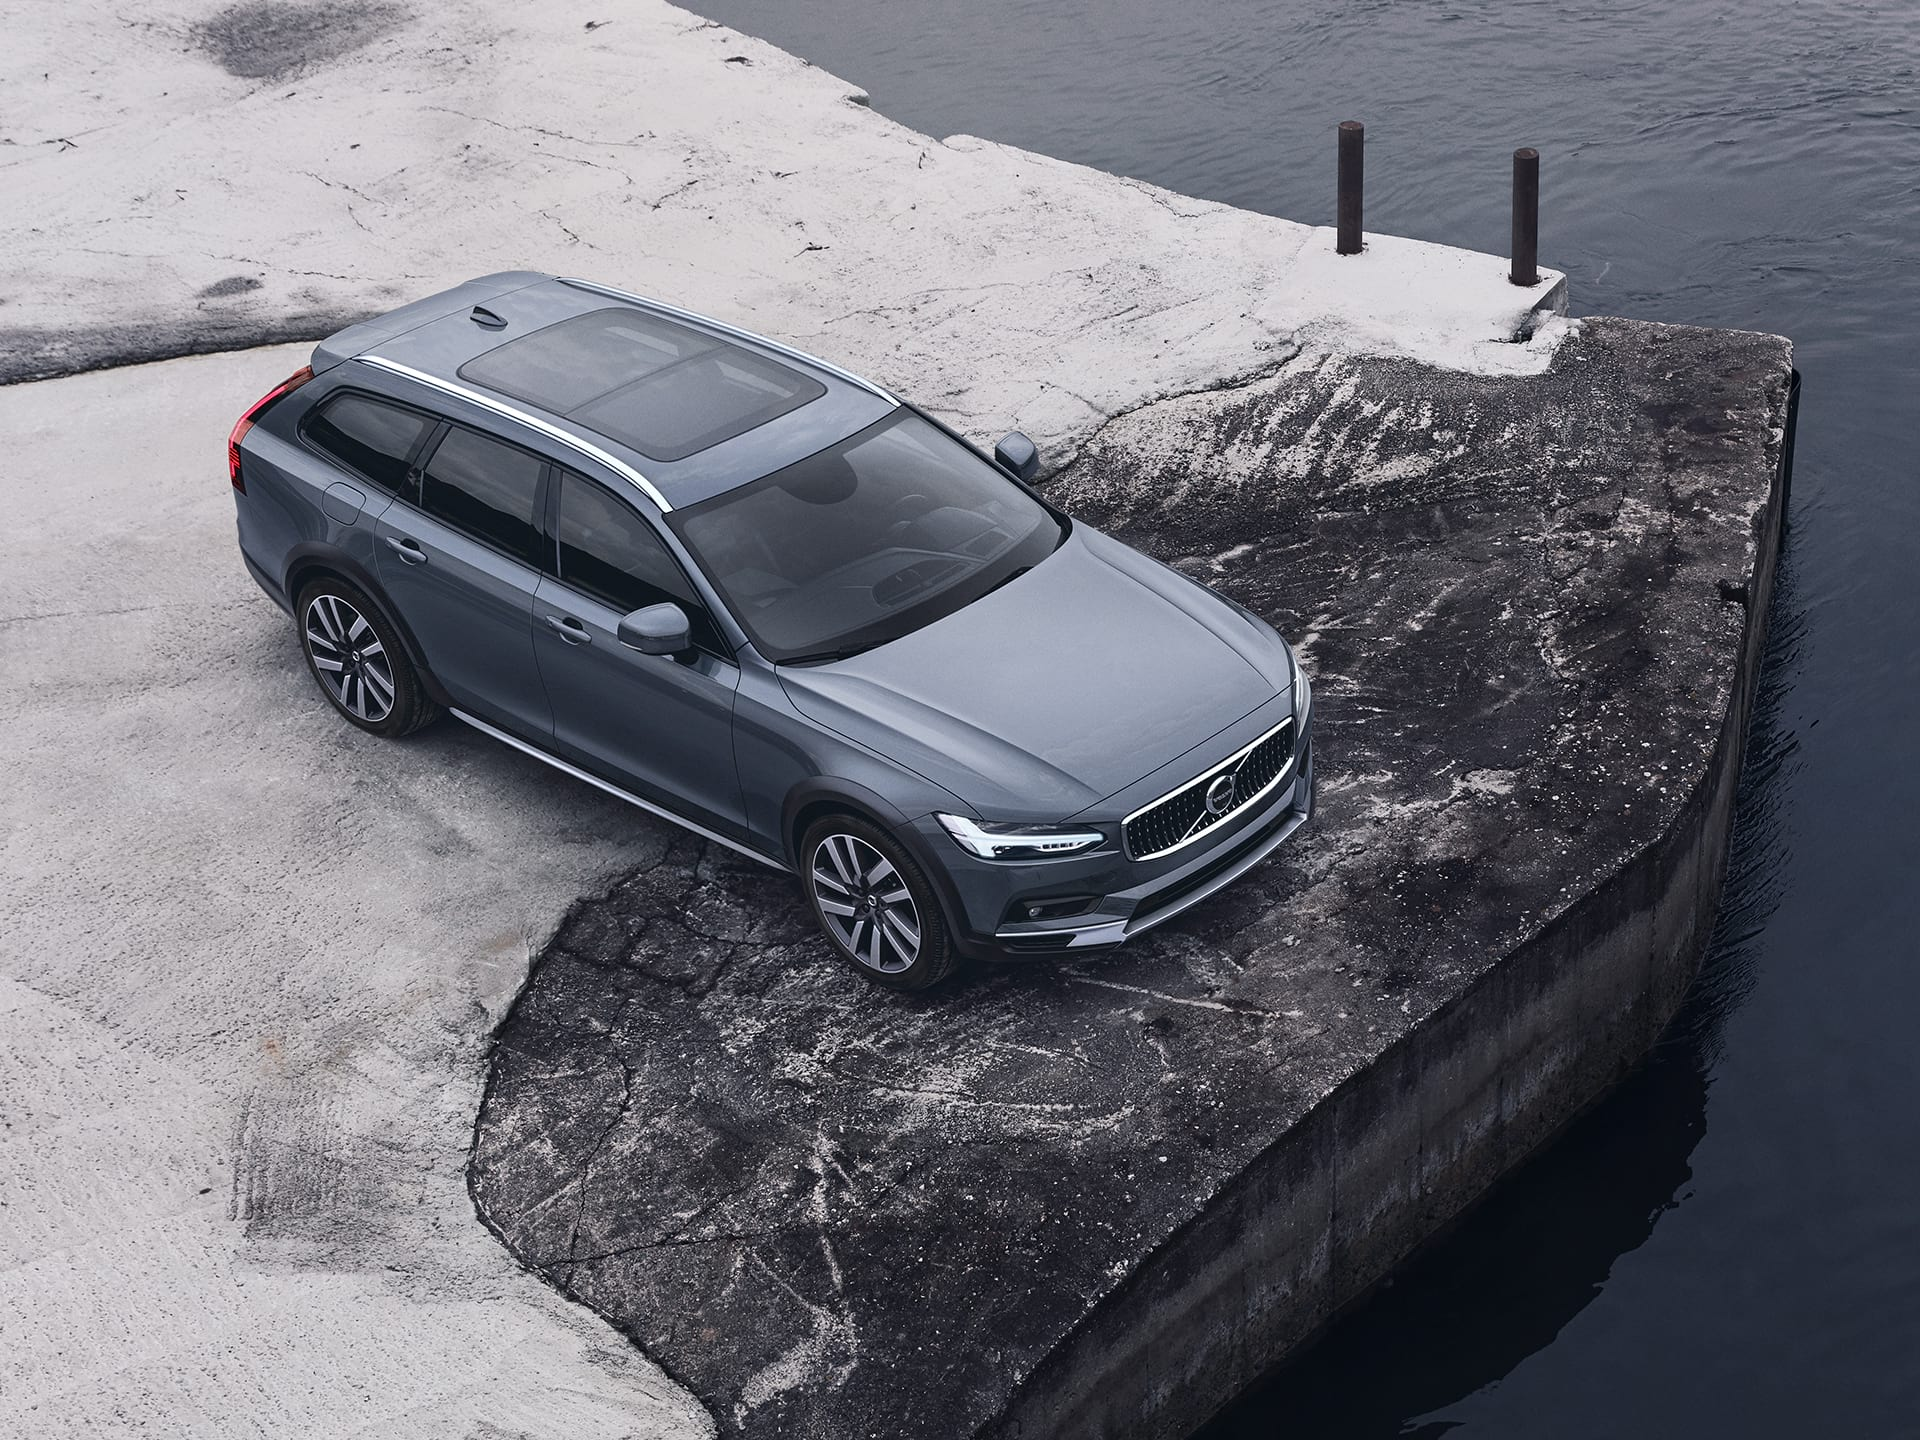 """Mussel Blue"" spalvos ""Volvo V90 Cross Country"", pastatytas šalia vandens."